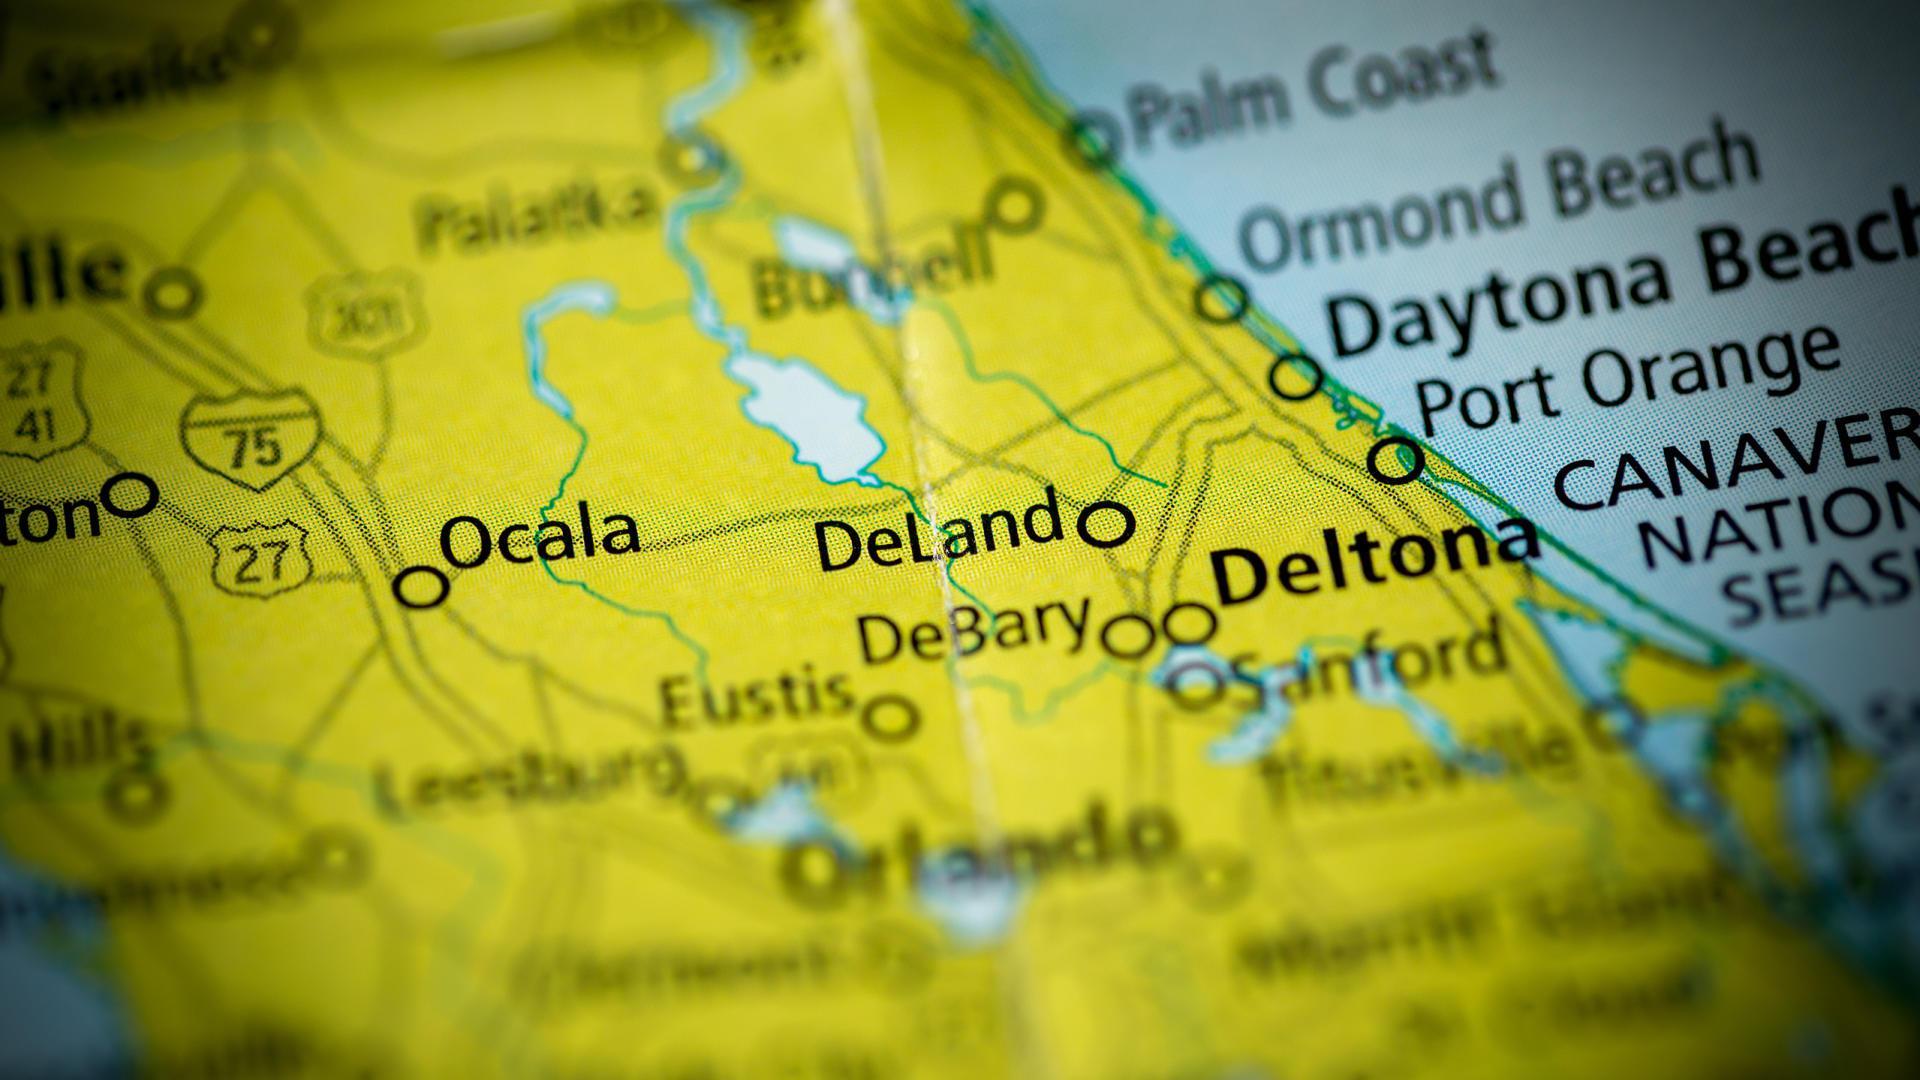 'Deland' by MARONDA - ORLANDO WEST in Daytona Beach